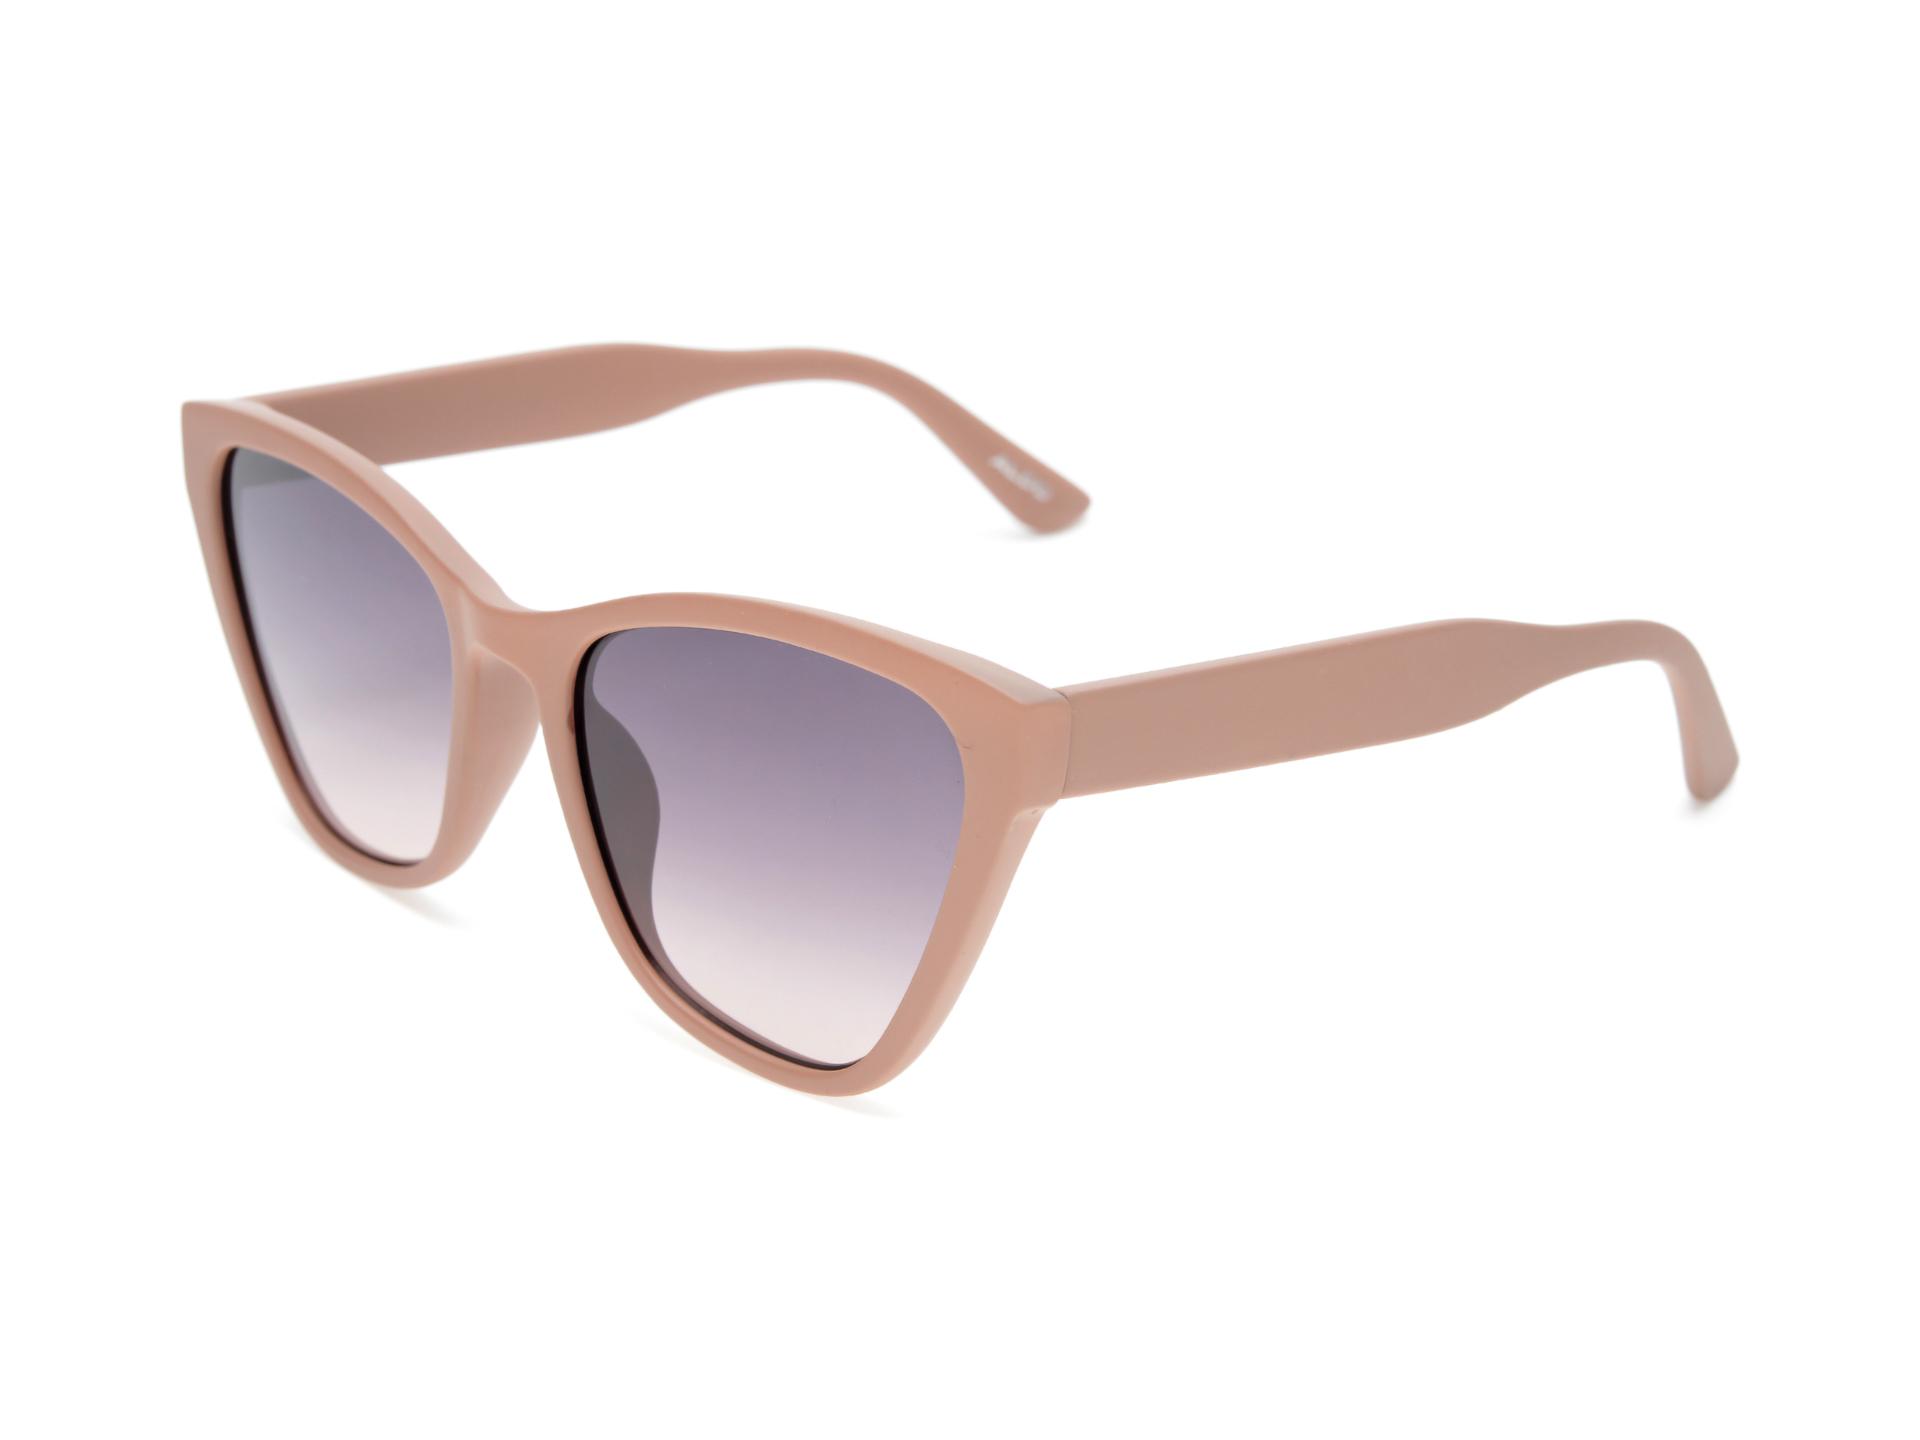 Ochelari de soare ALDO bej, Boskear101, din pvc imagine otter.ro 2021